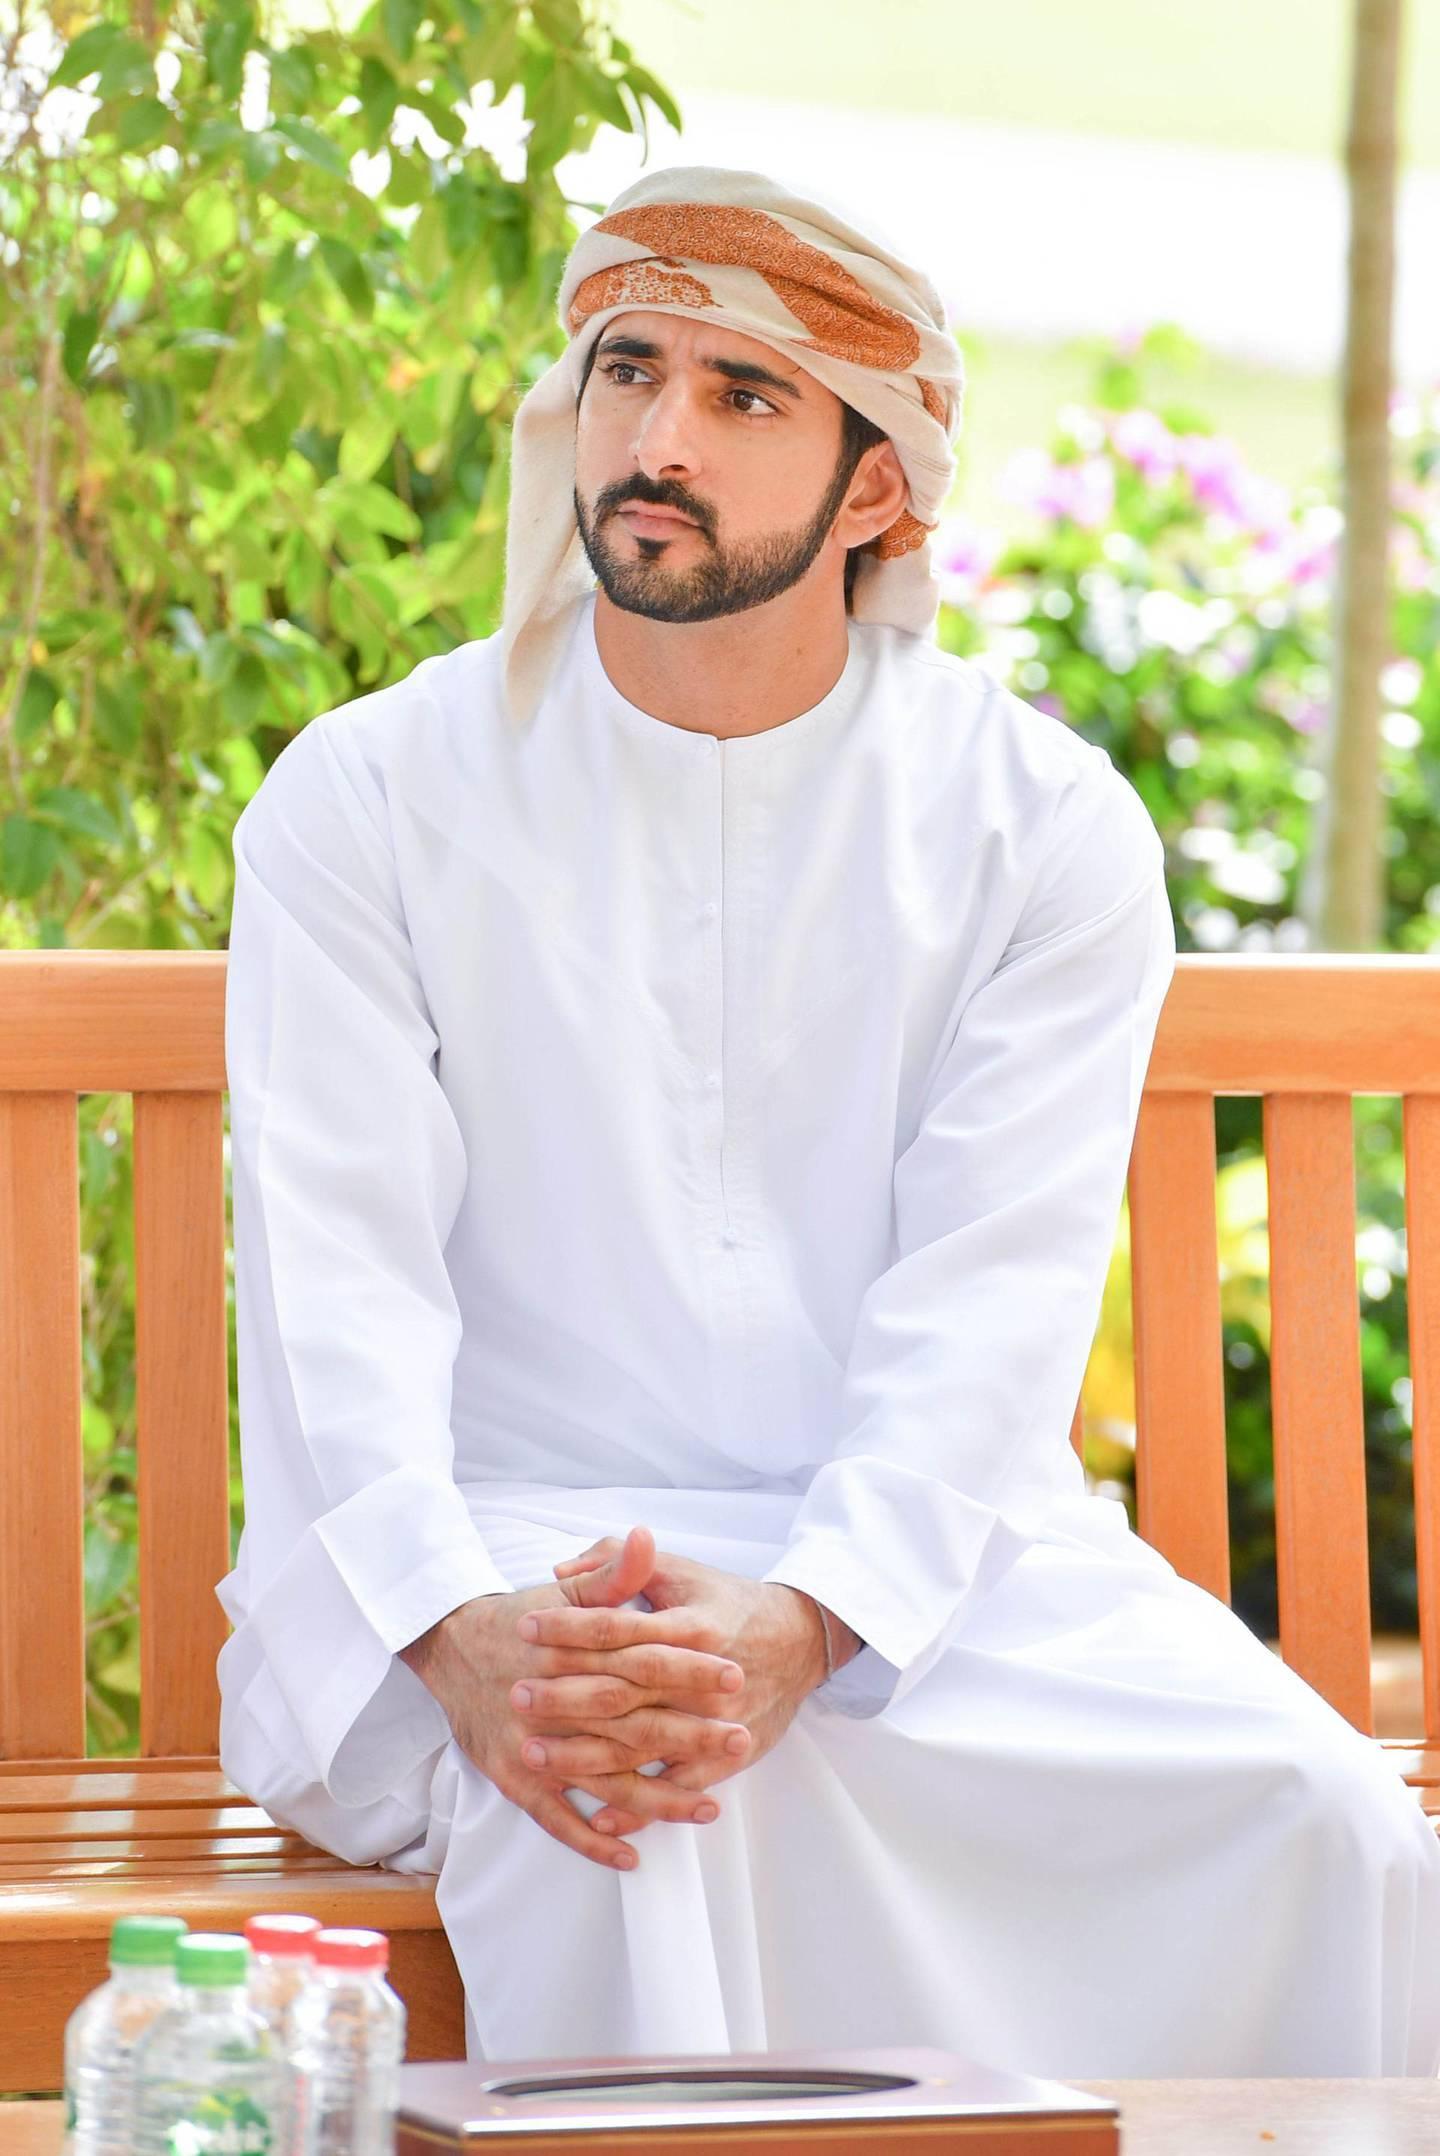 Sheikh Hamdan bin Mohammed bin Rashid Al Maktoum, Crown Prince of Dubai. Dubai Media Office / Wam